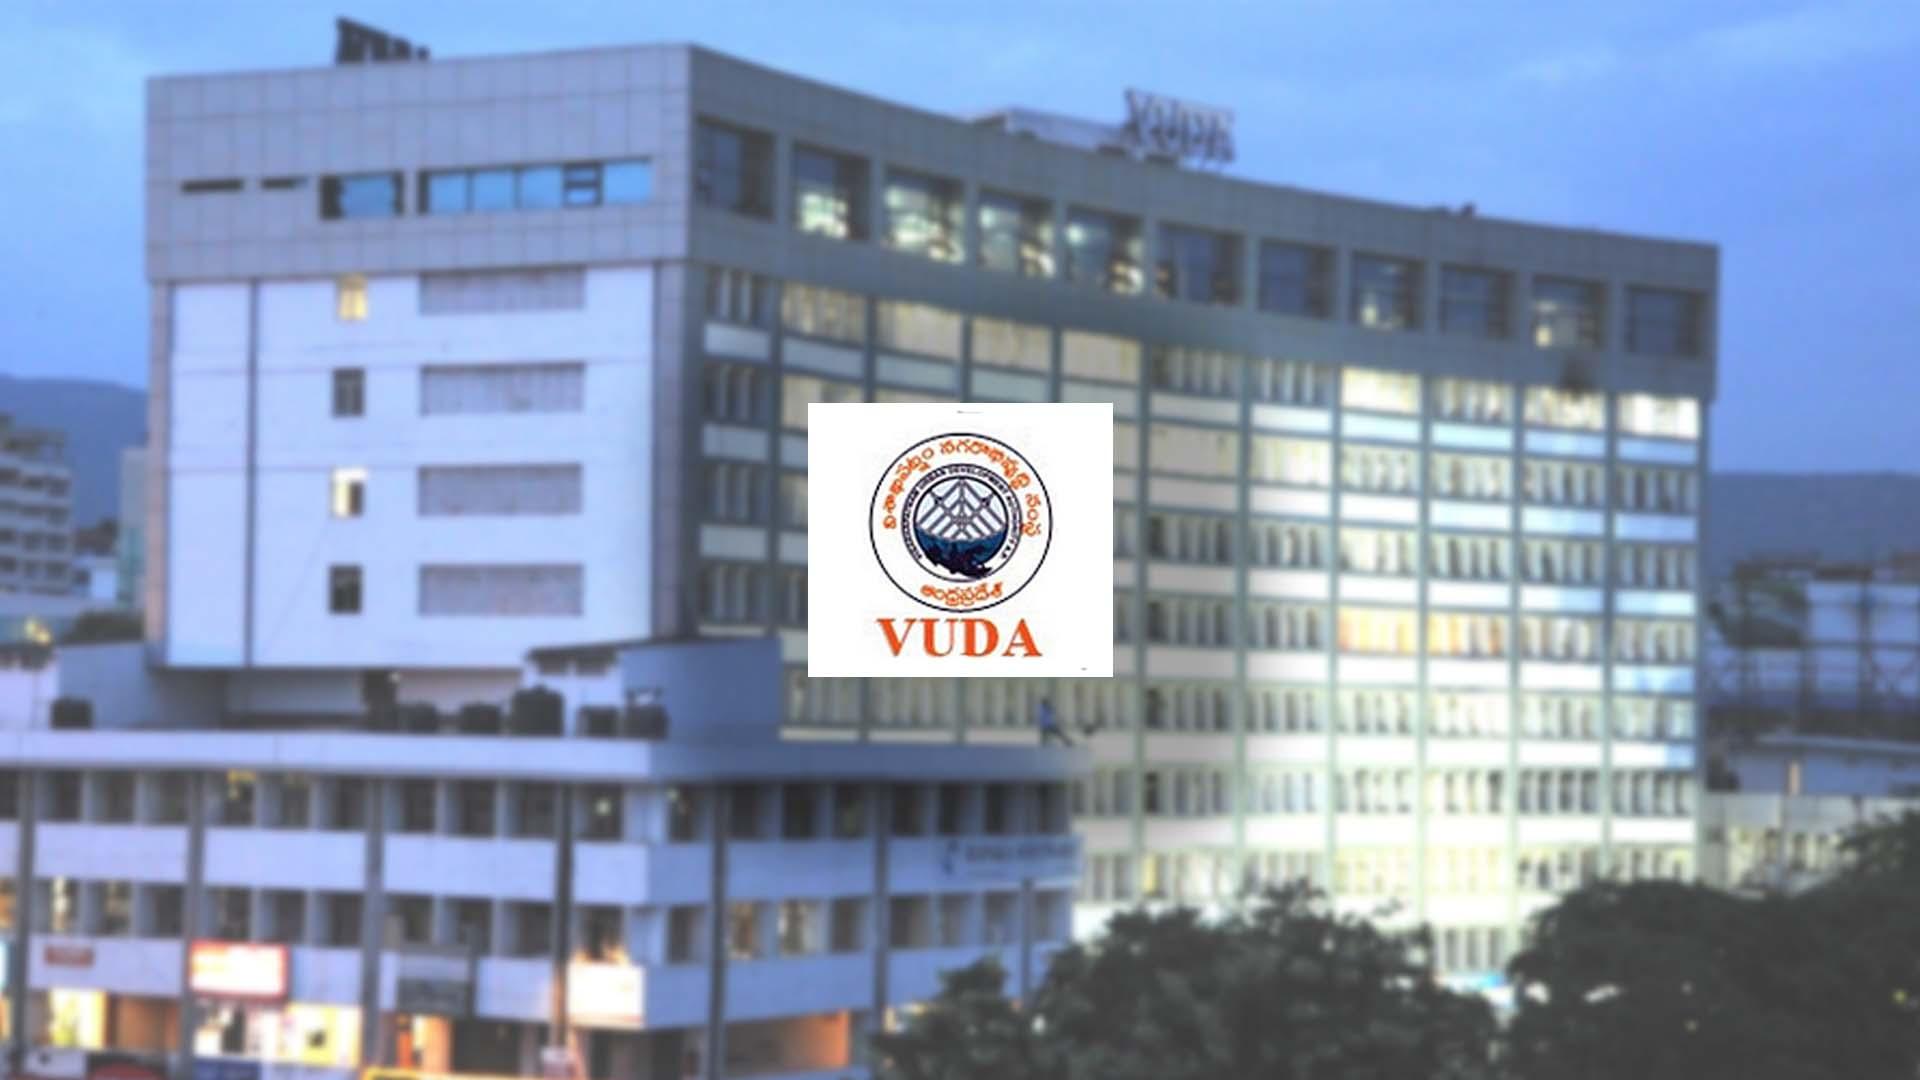 Vishakhapatnam Urban Development Authority